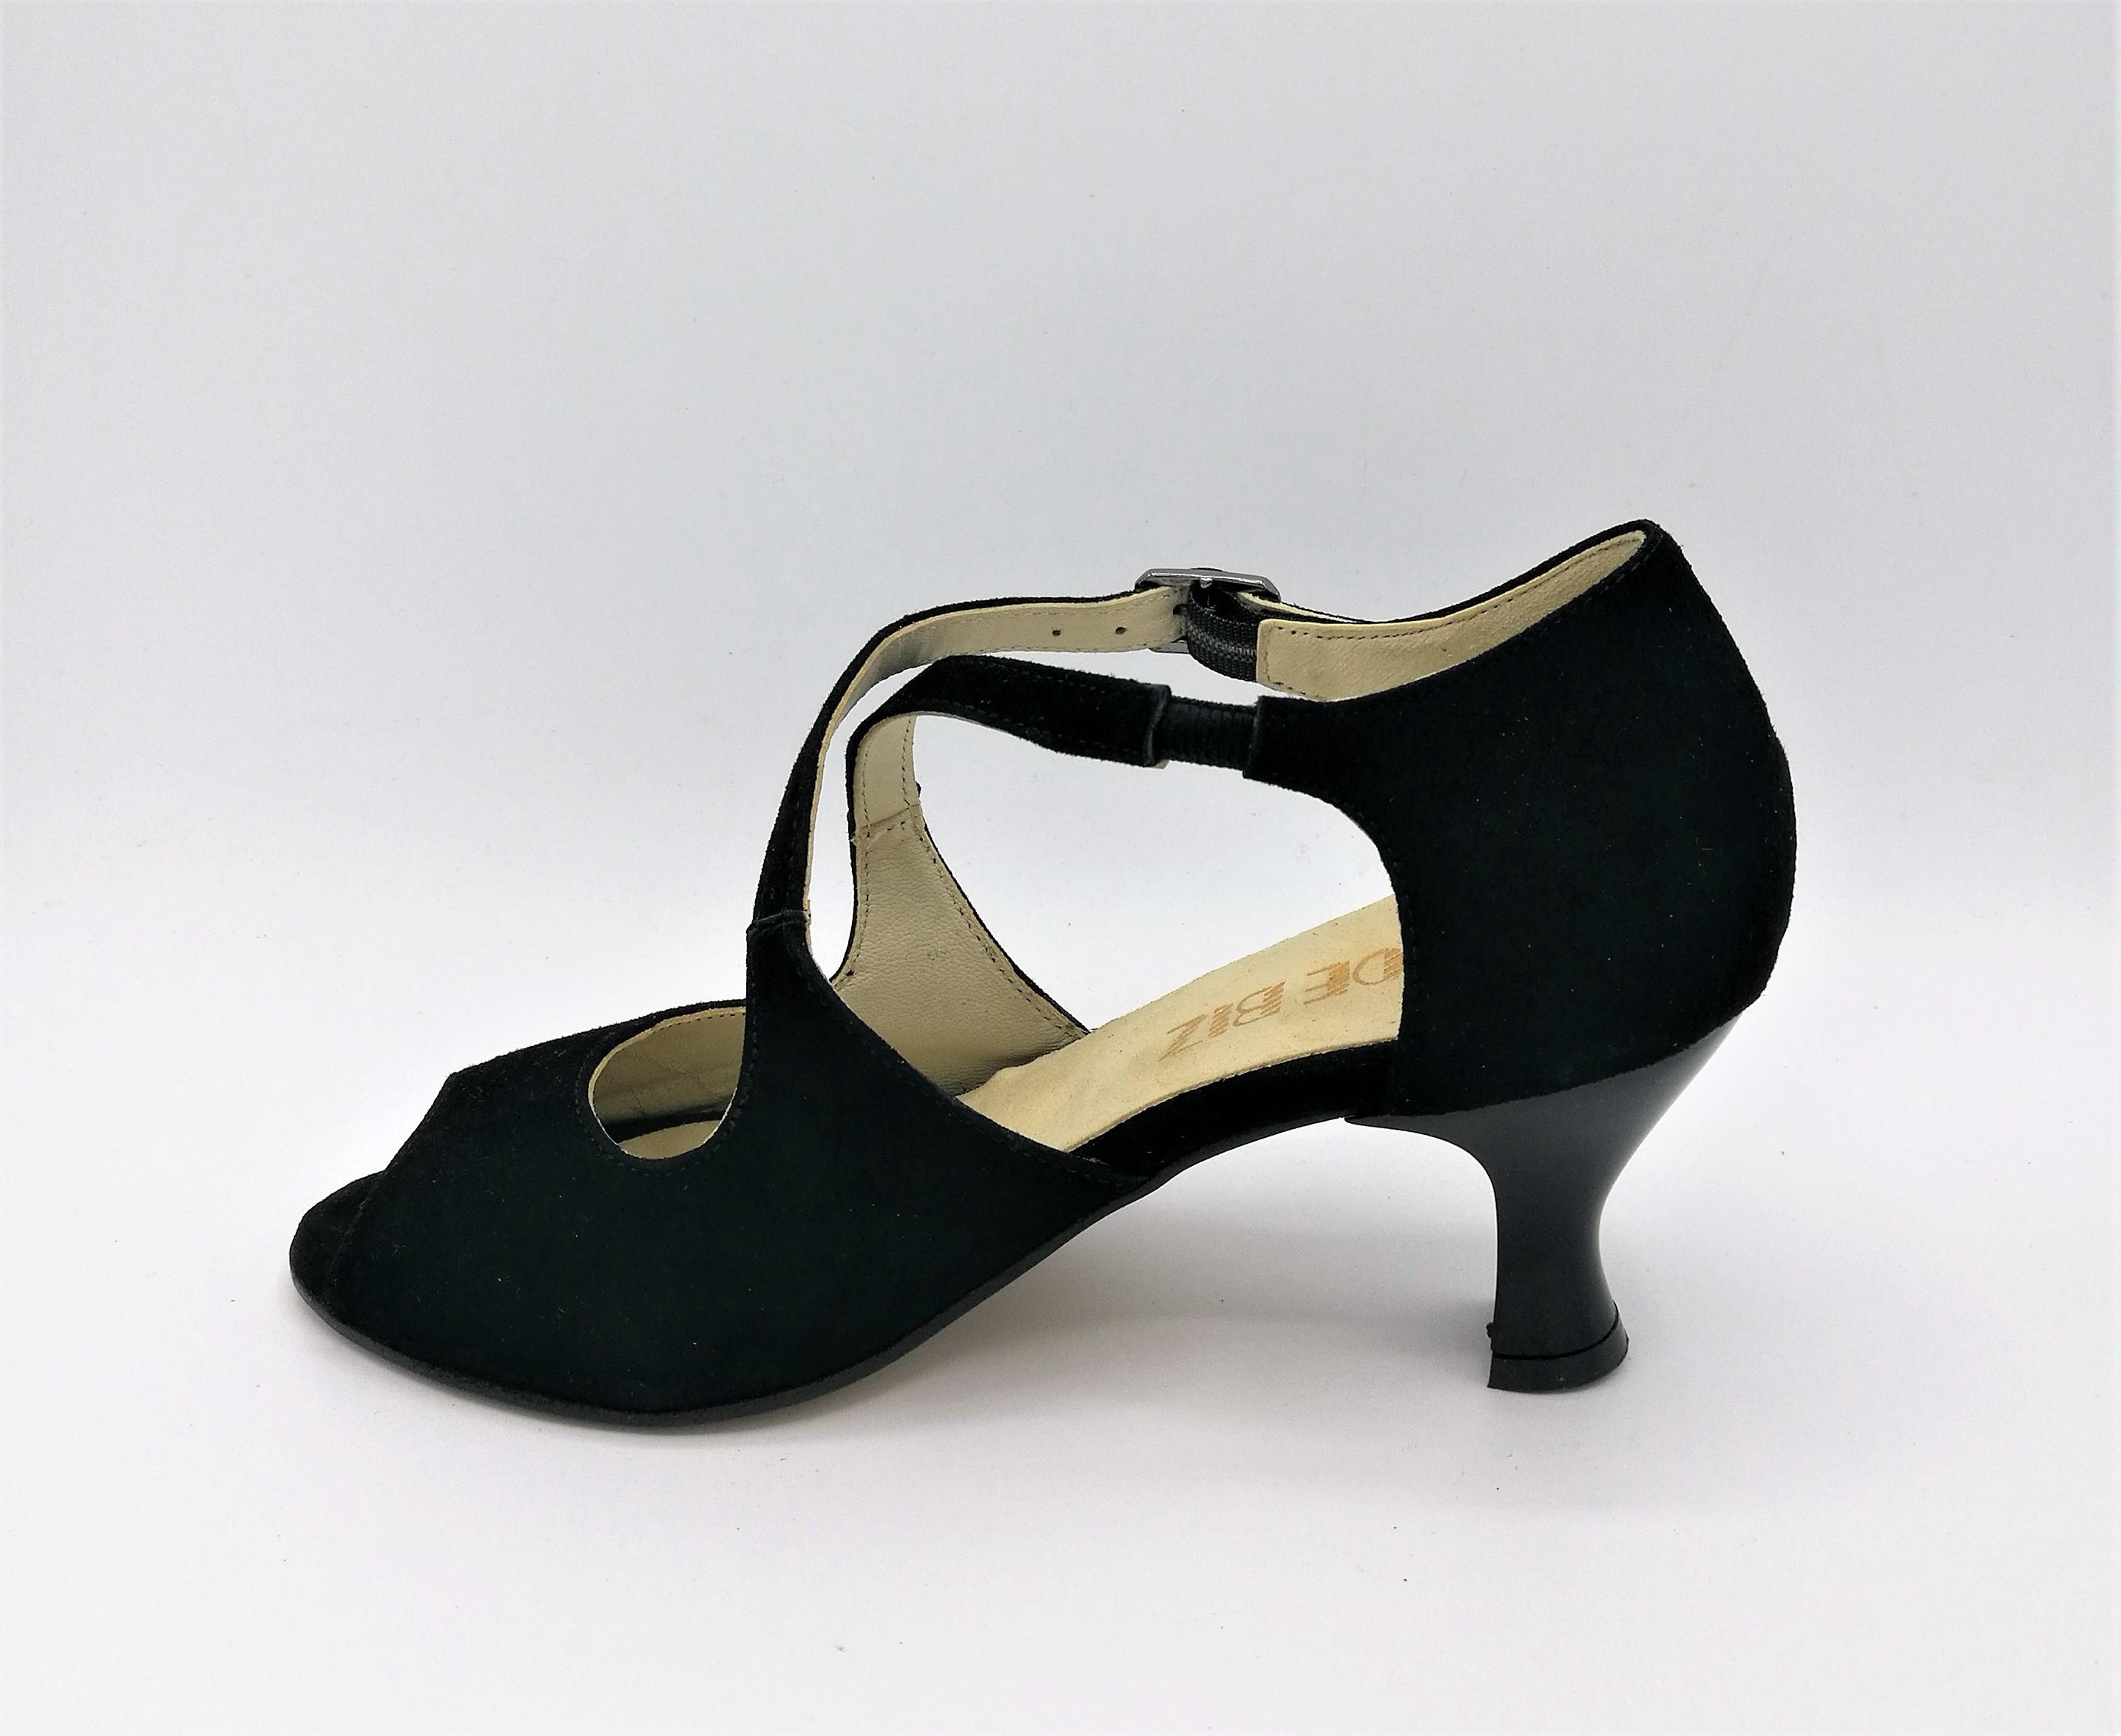 Schuhebiz S2040 scarpe scarpe scarpe da ballo camoscio vernice nero 20f9cd